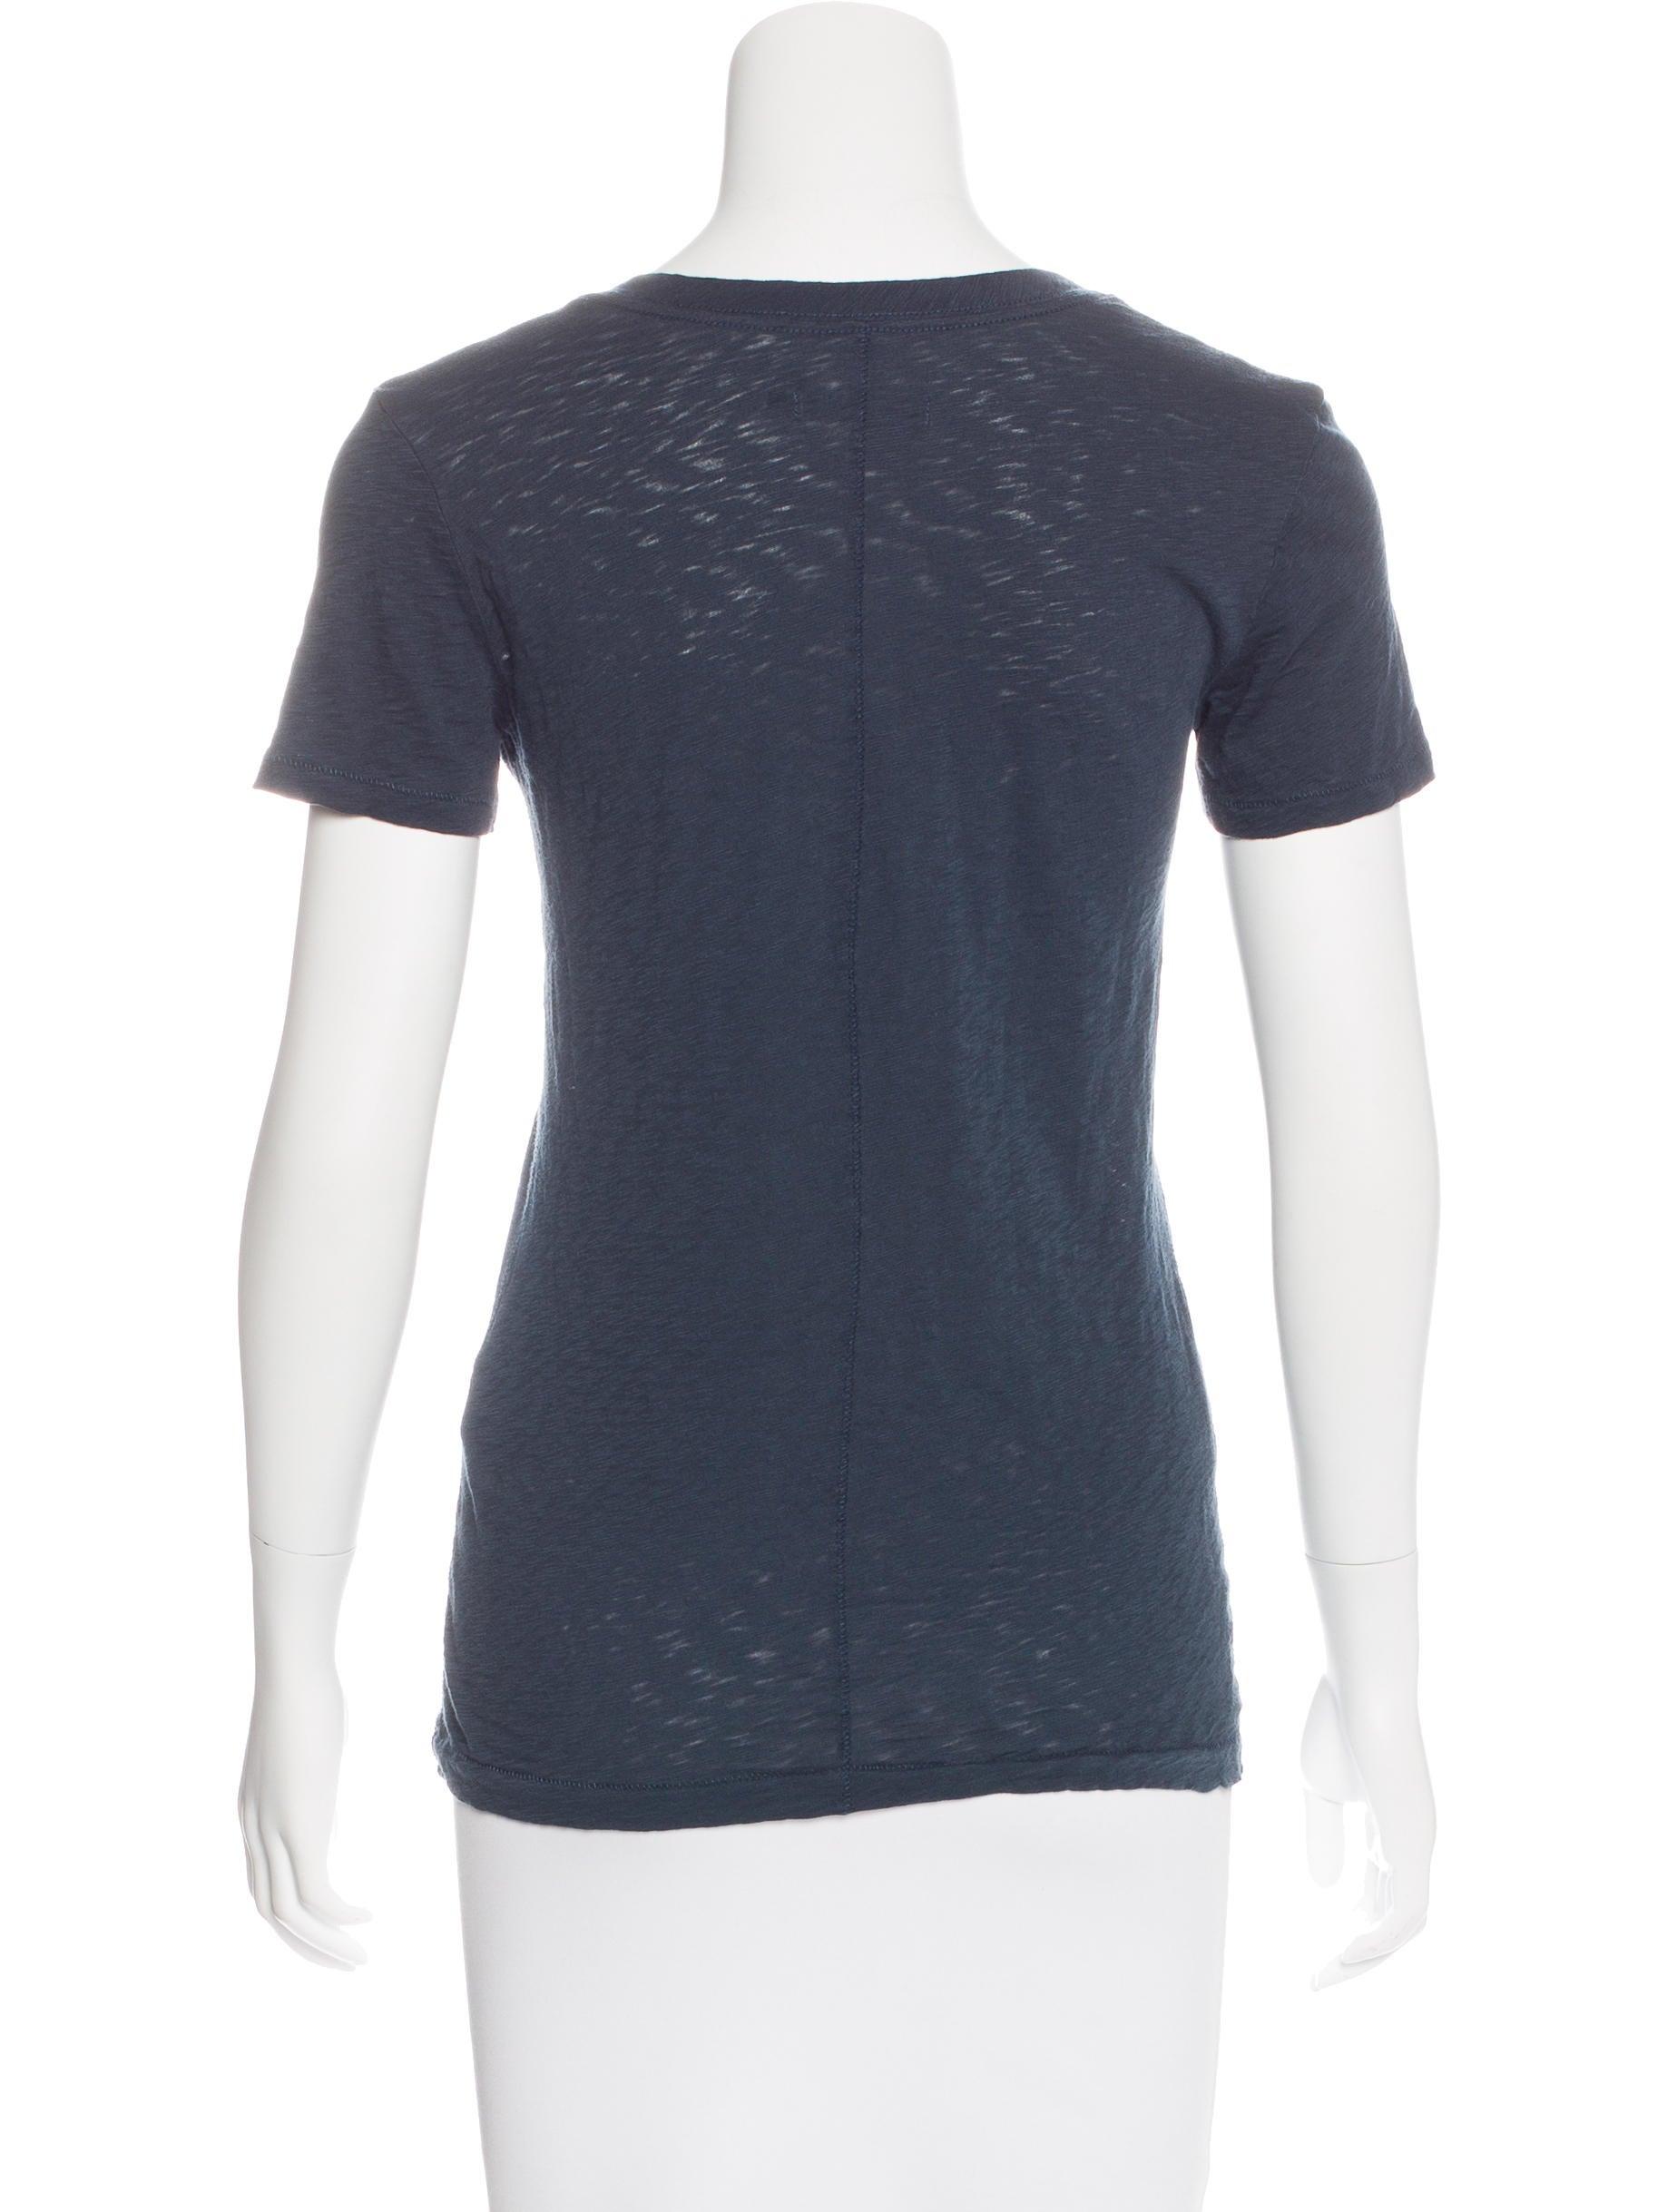 Rag bone v neck short sleeve t shirt clothing for Rag bone shirt